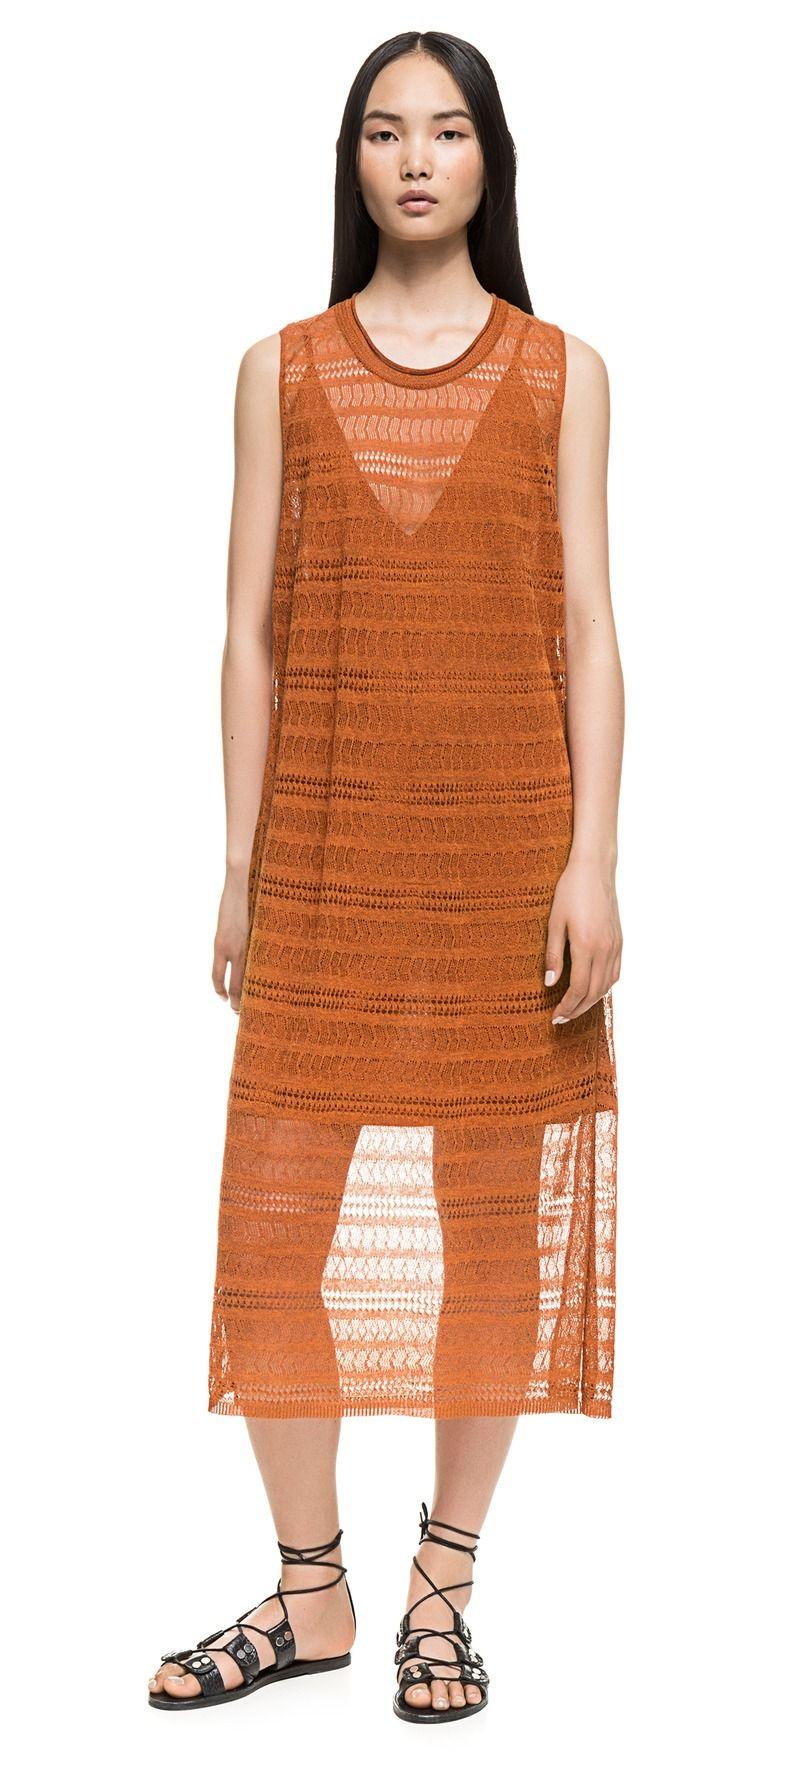 Dresses long lace dress burned orangegold rustic salt water